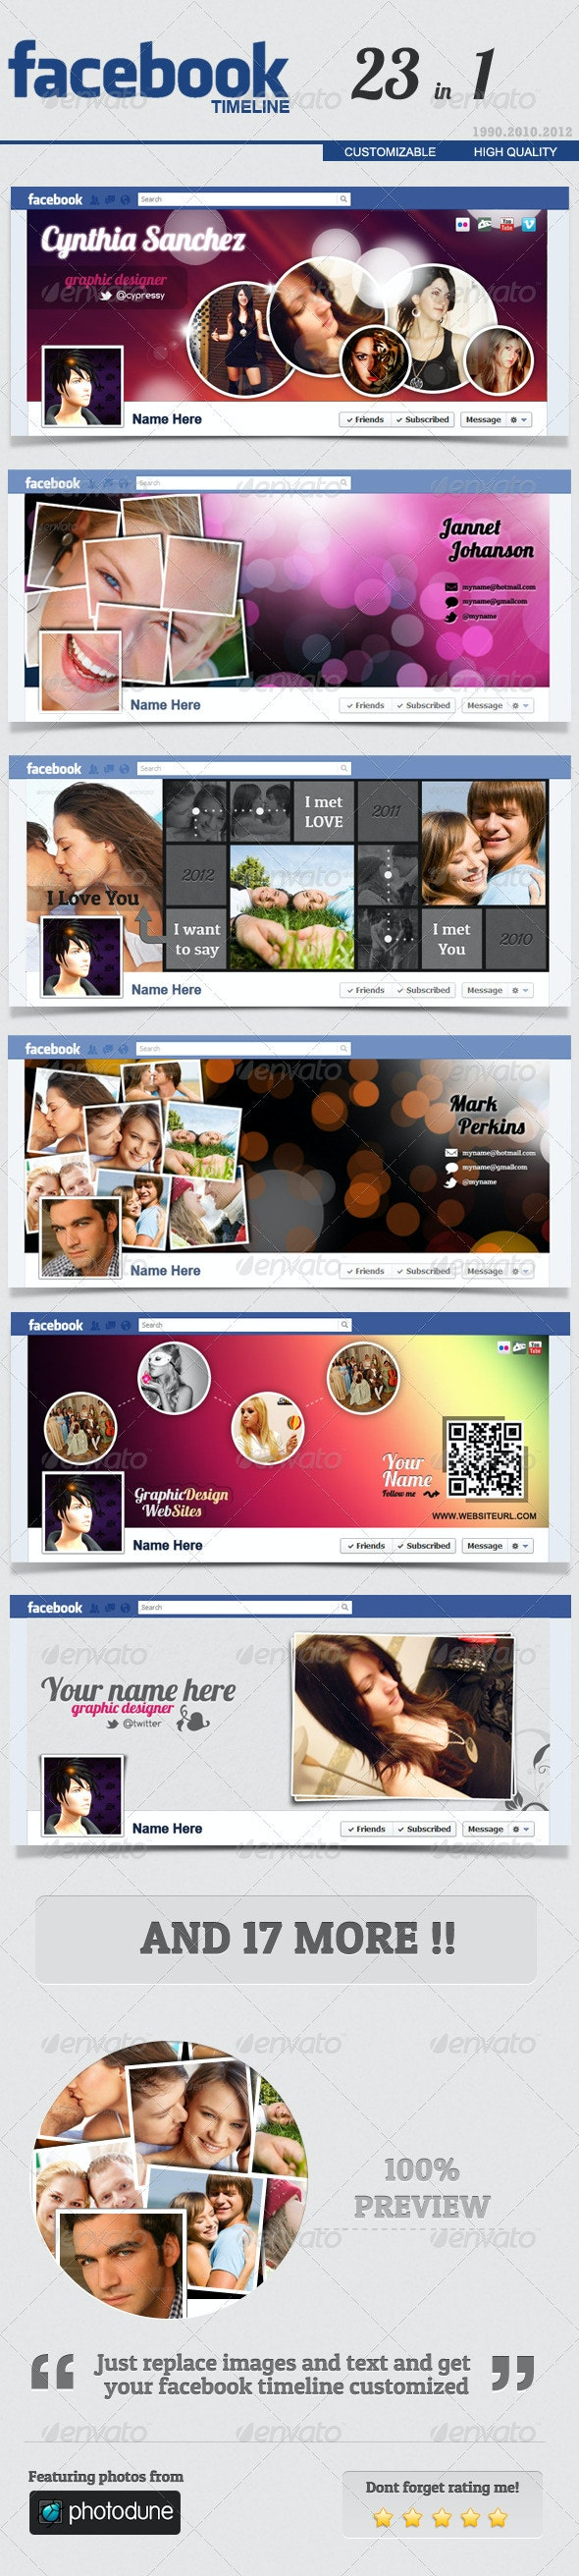 Facebook Timeline Cover FULL 23 in 1